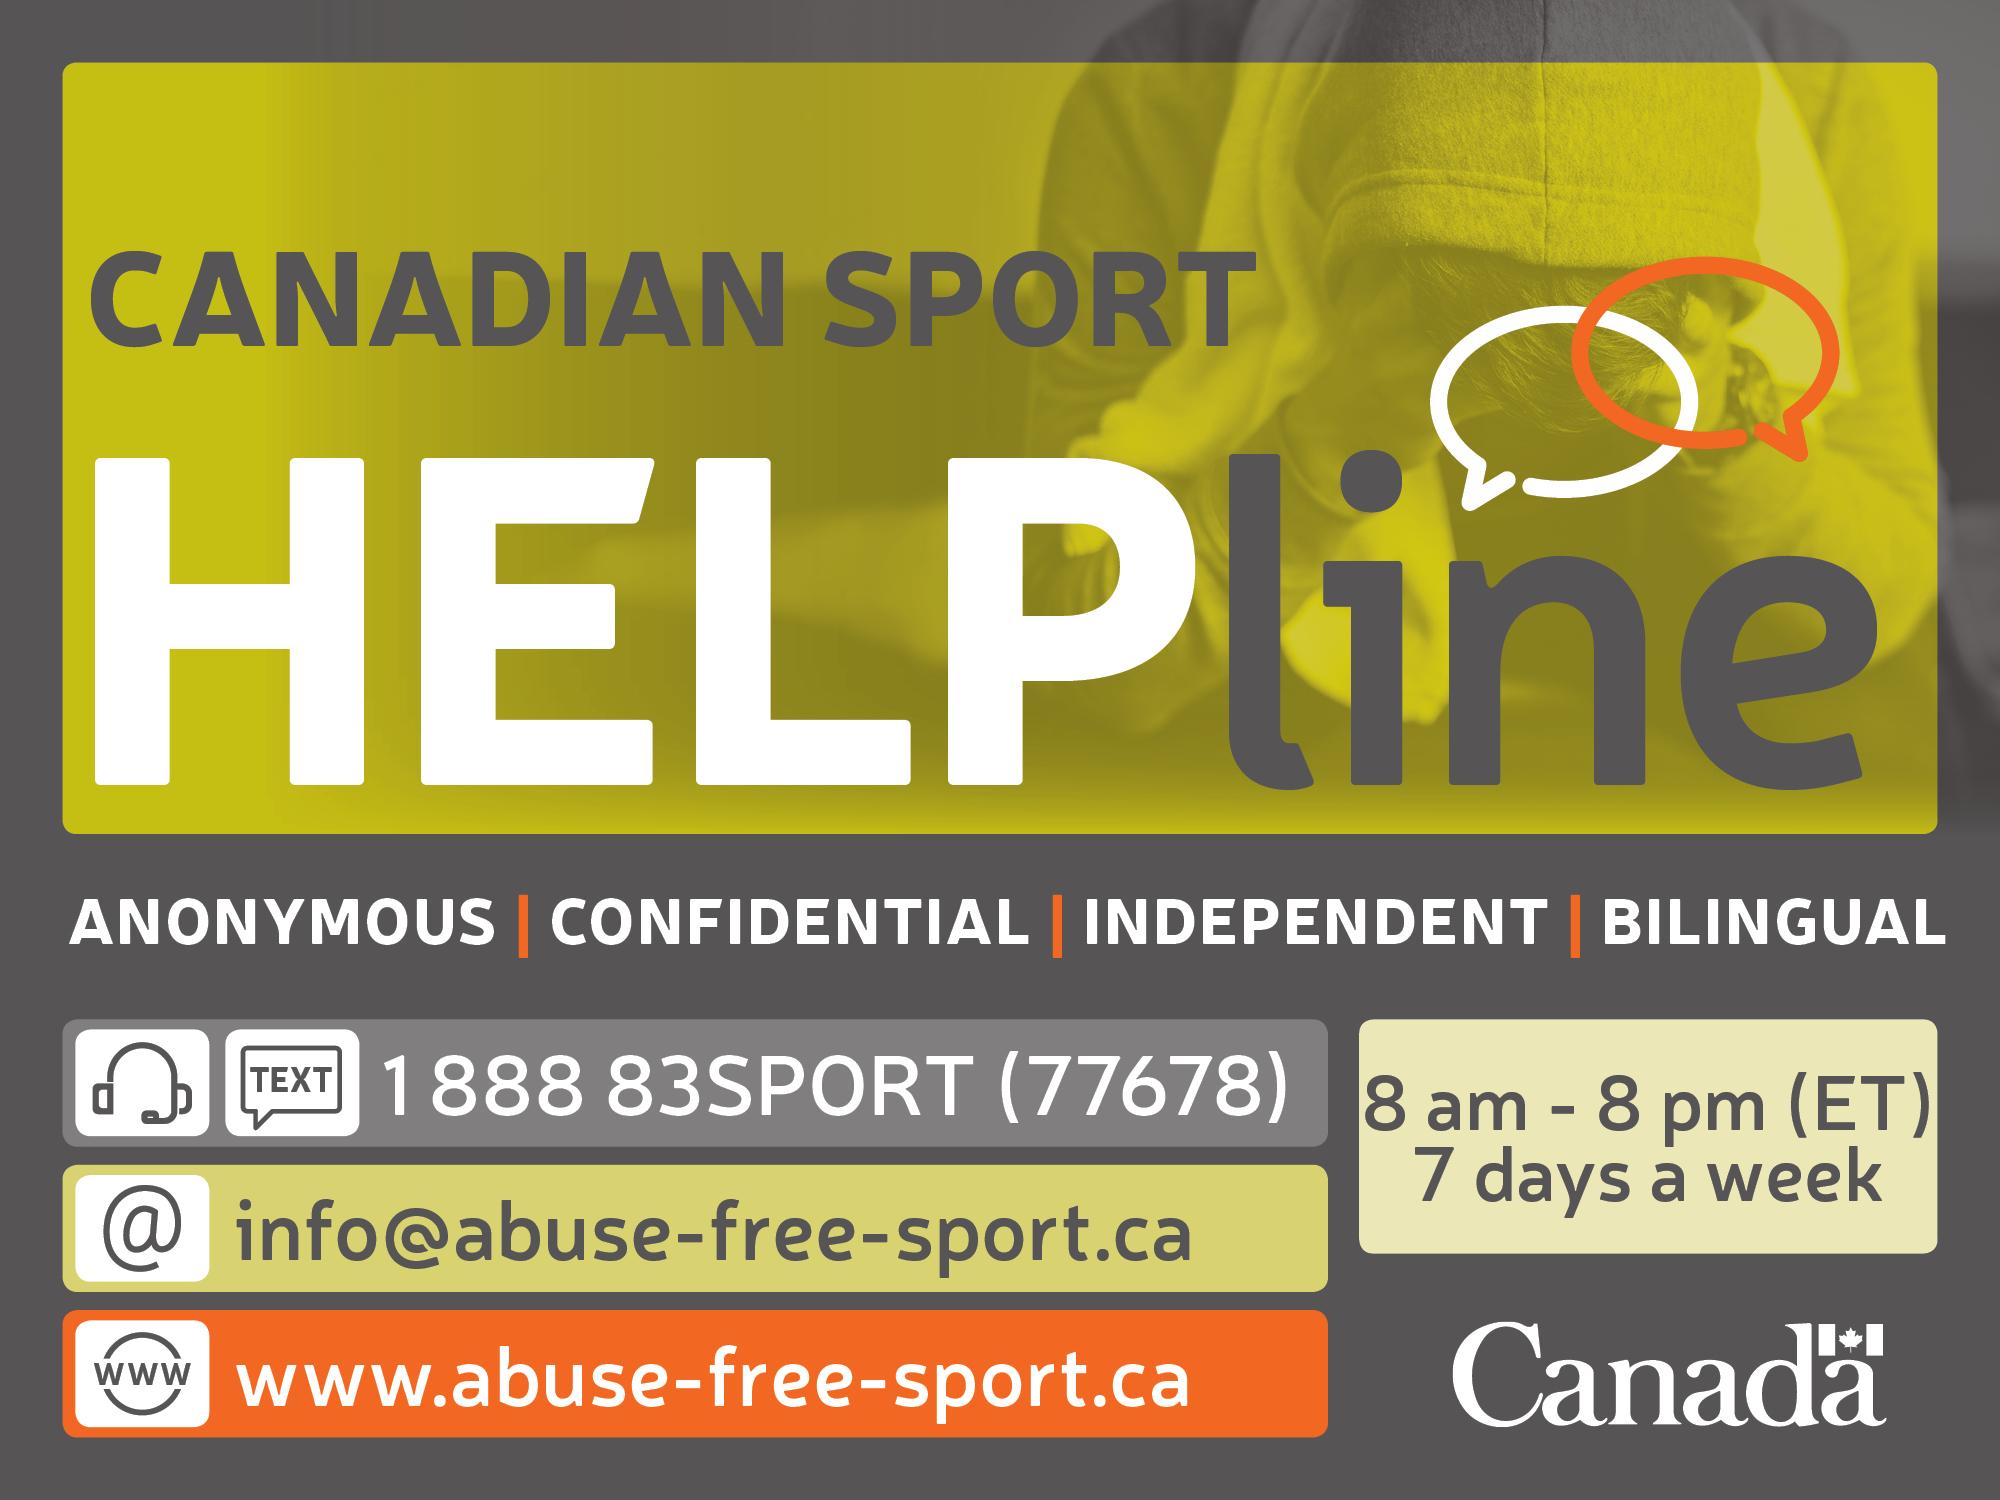 Contact the Safe Sport Helpline